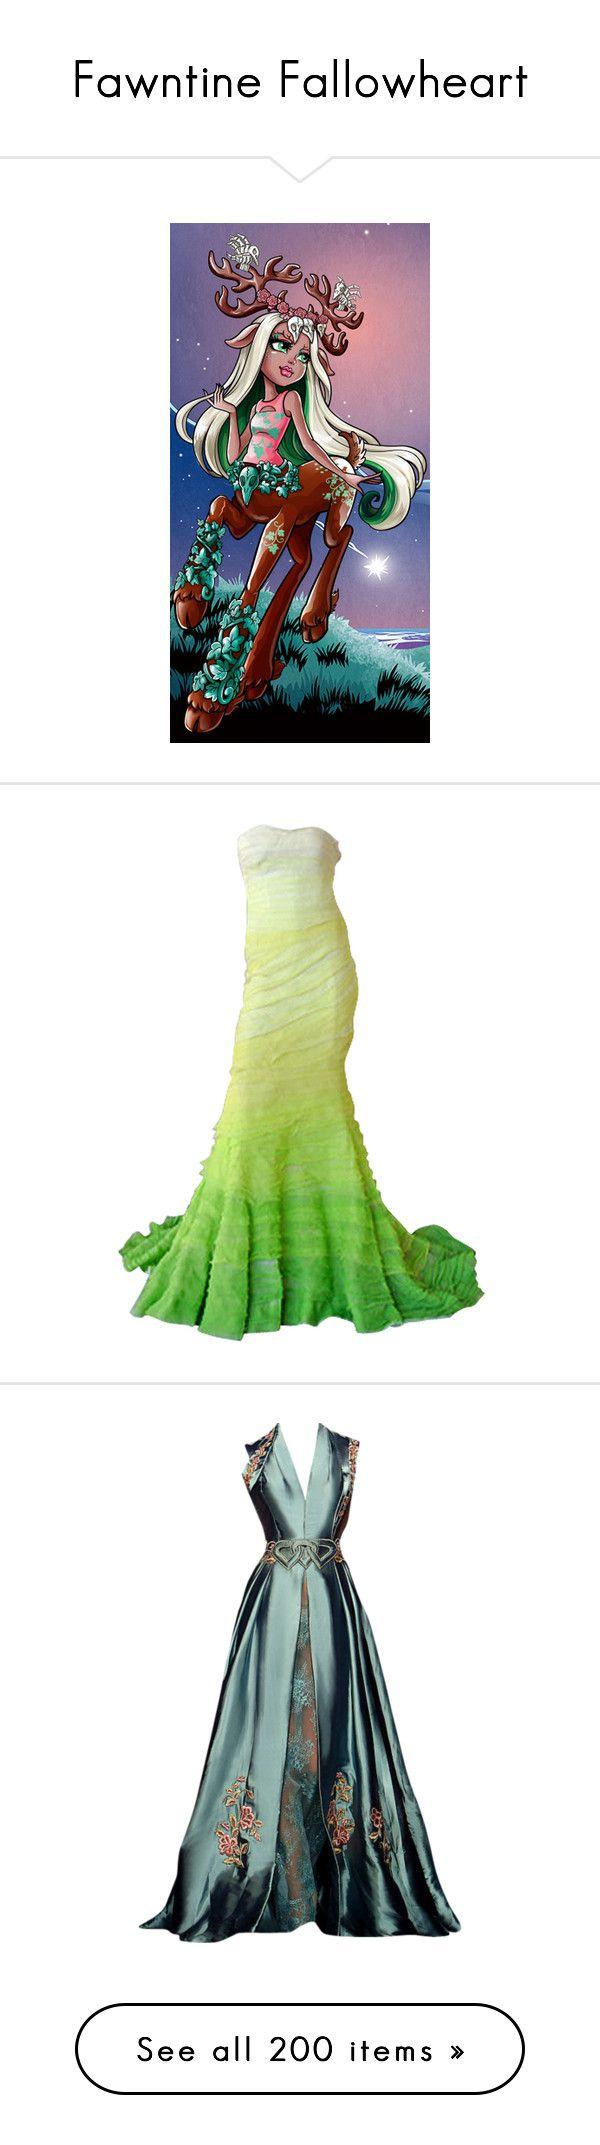 """Fawntine Fallowheart"" by bluetidegirl ❤ liked on Polyvore featuring monster high, dresses, gowns, green, long dress, long green dress, nina ricci dresses, nina ricci gown, nina ricci and green evening dress"